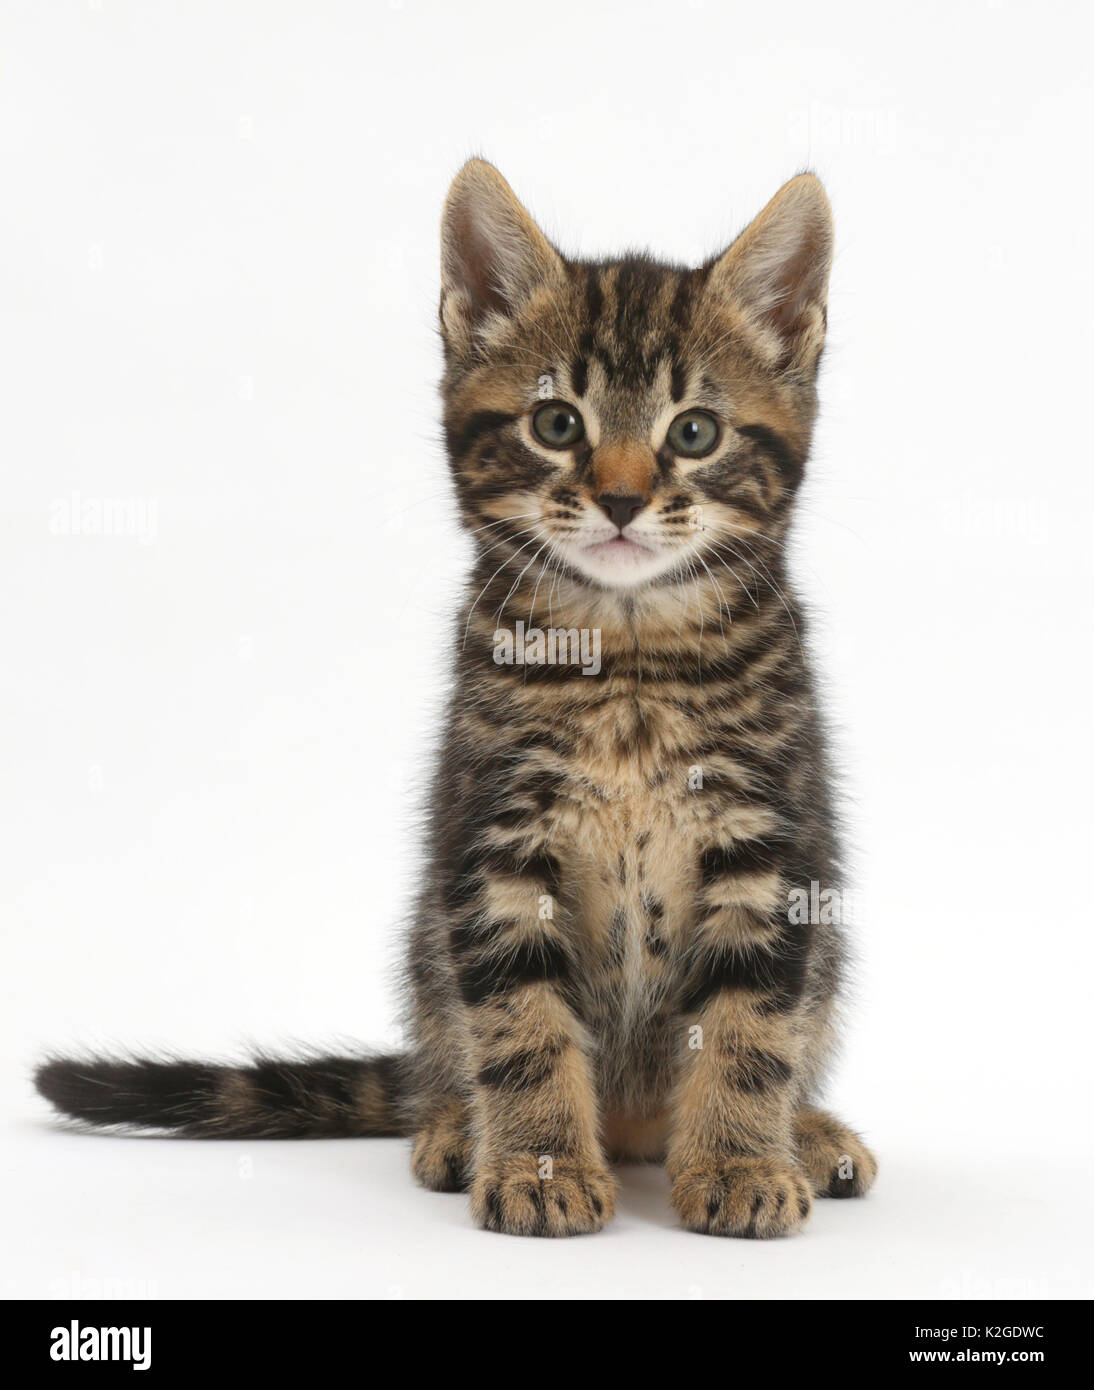 Tabby kitten, Smudge, 7 weeks, sitting. - Stock Image